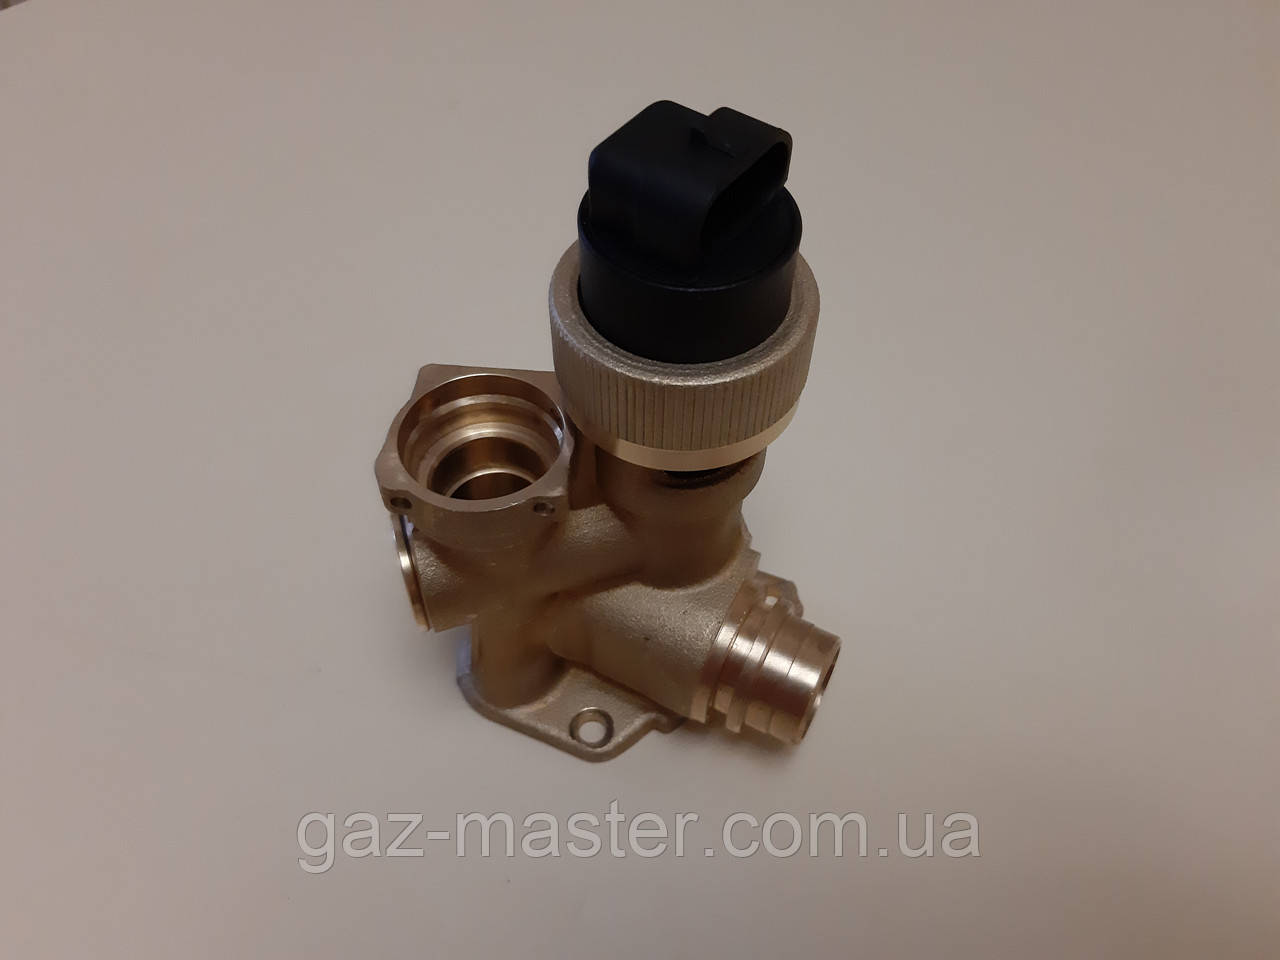 Трехходовой клапан с электроприводом Vaillant Atmotec, Turbotec Pro/Plus,  178978